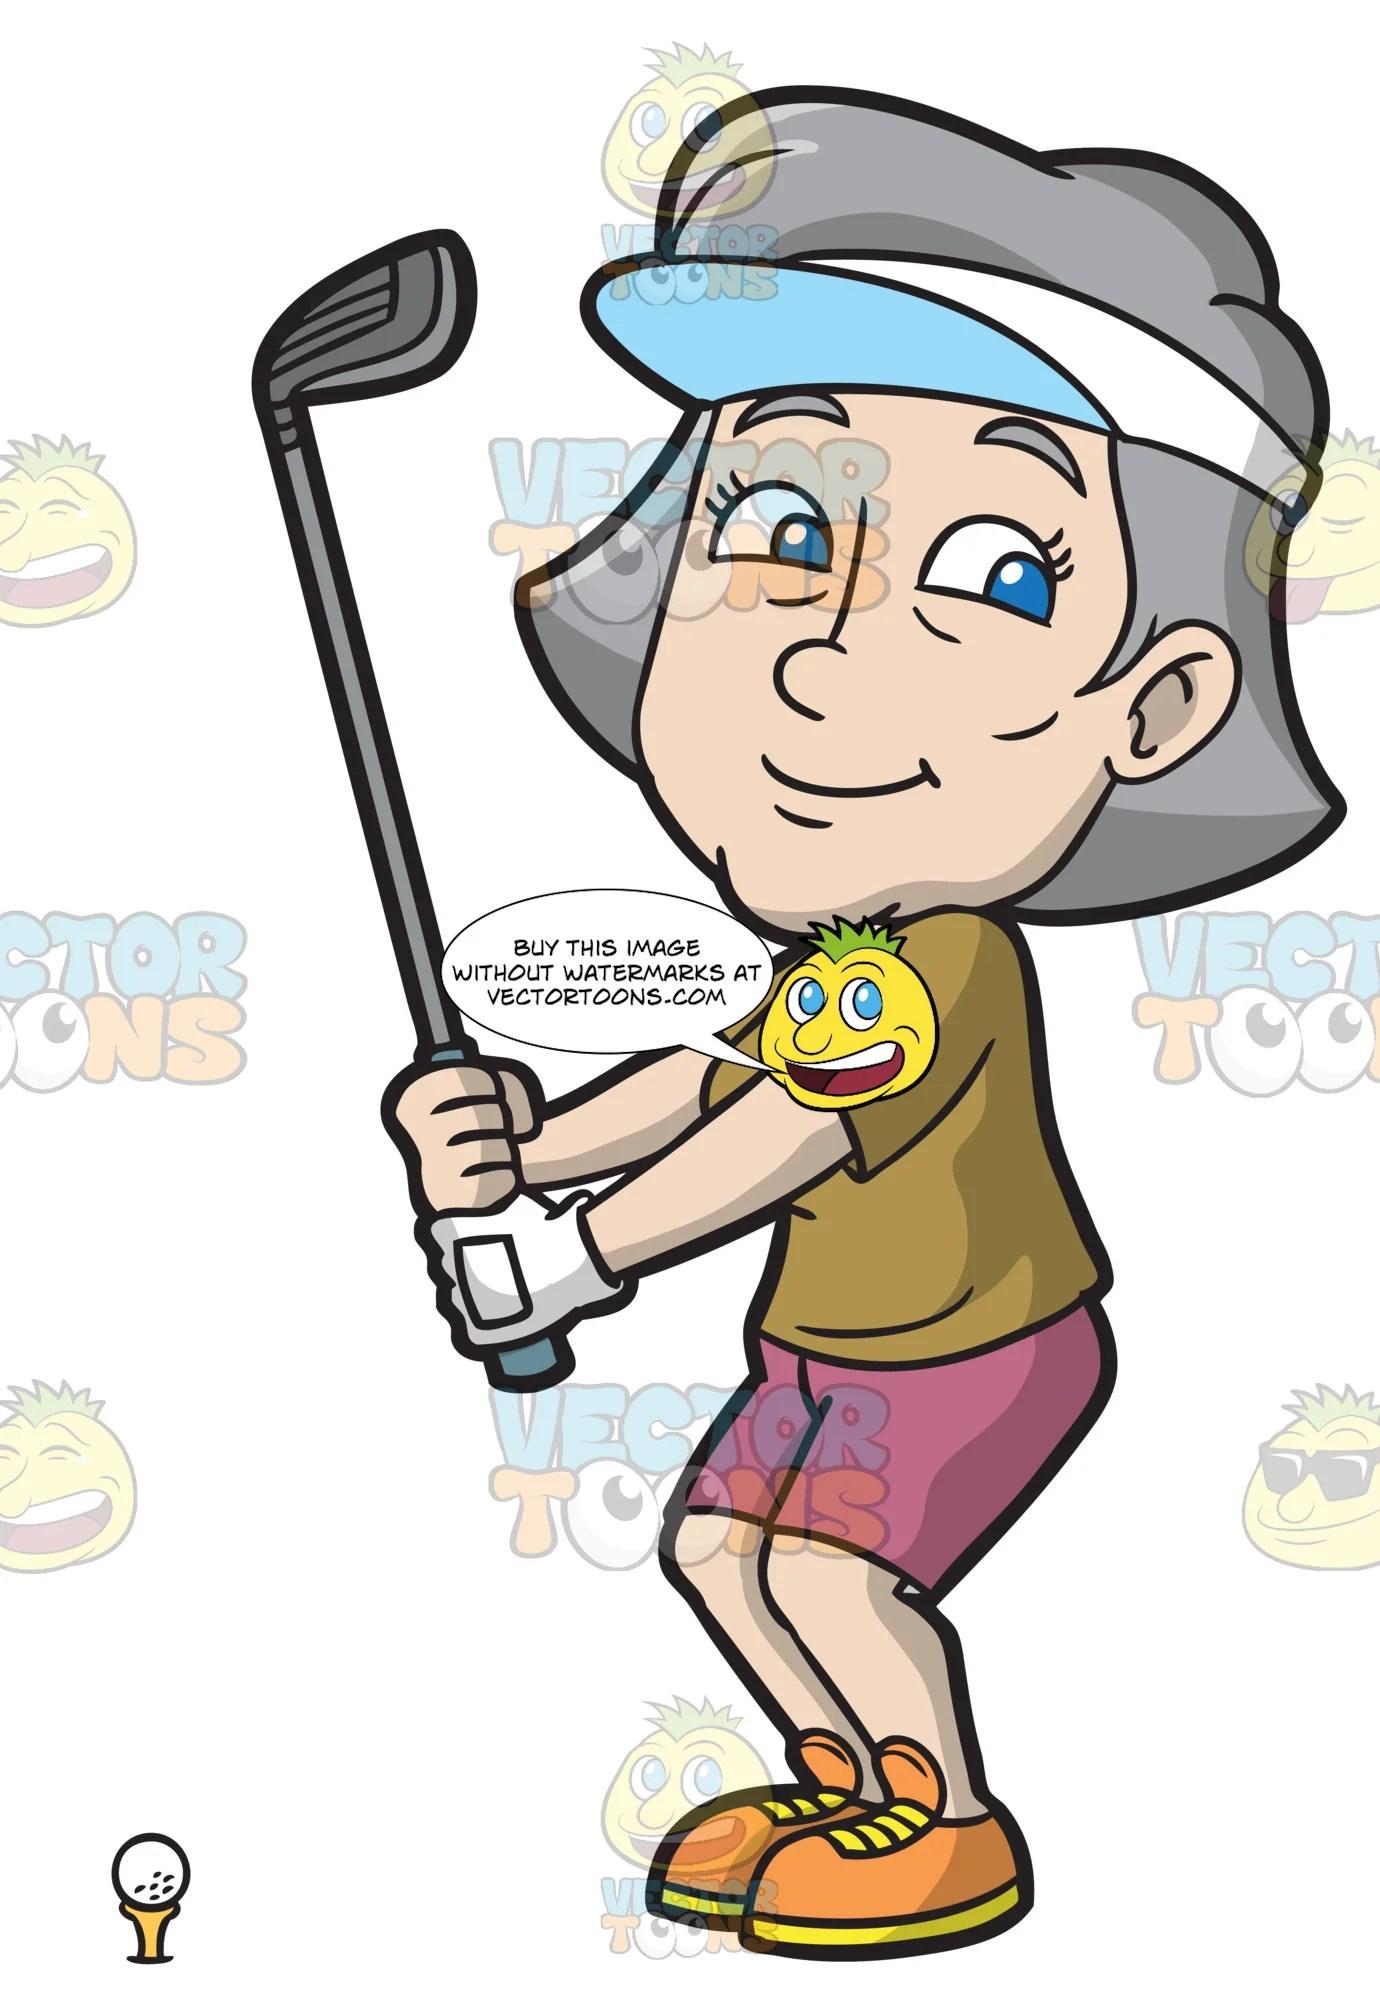 medium resolution of a fun mature woman enjoying a game of golf clipart cartoons by vectortoons